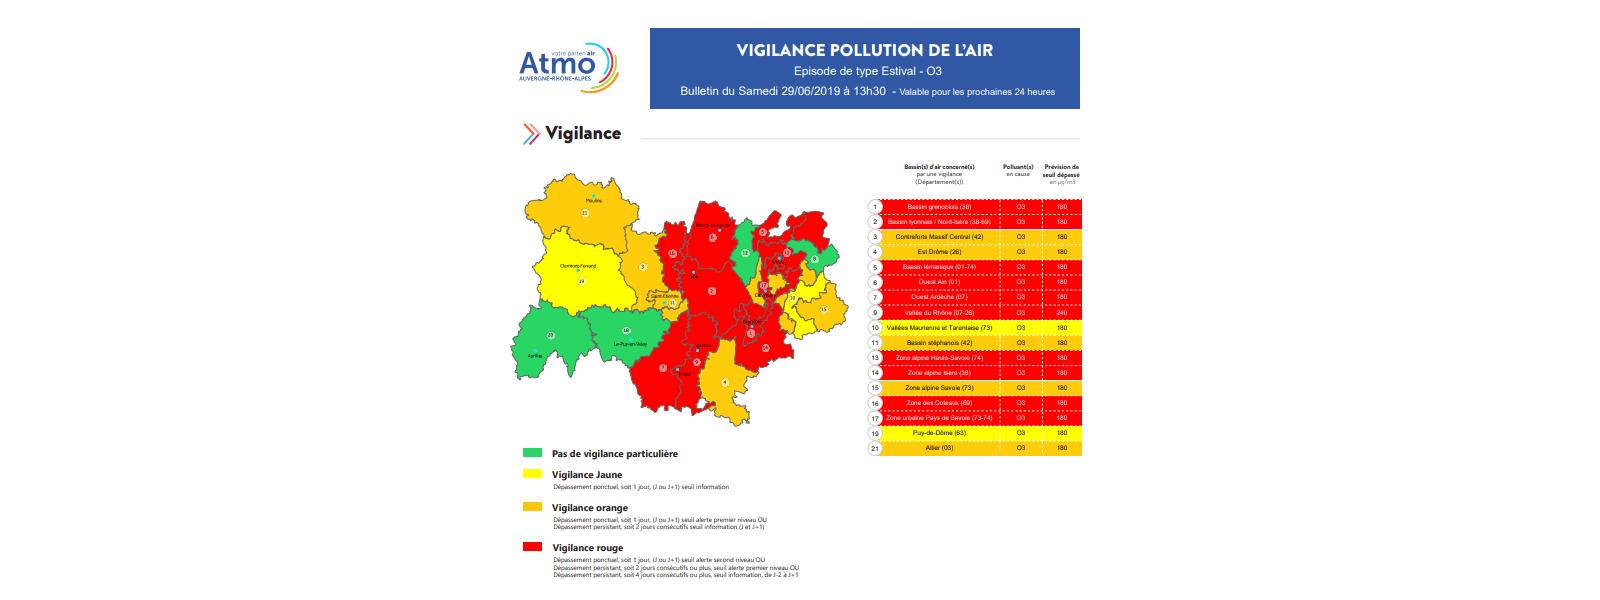 Vigilance pollution air - 29 juin 2019